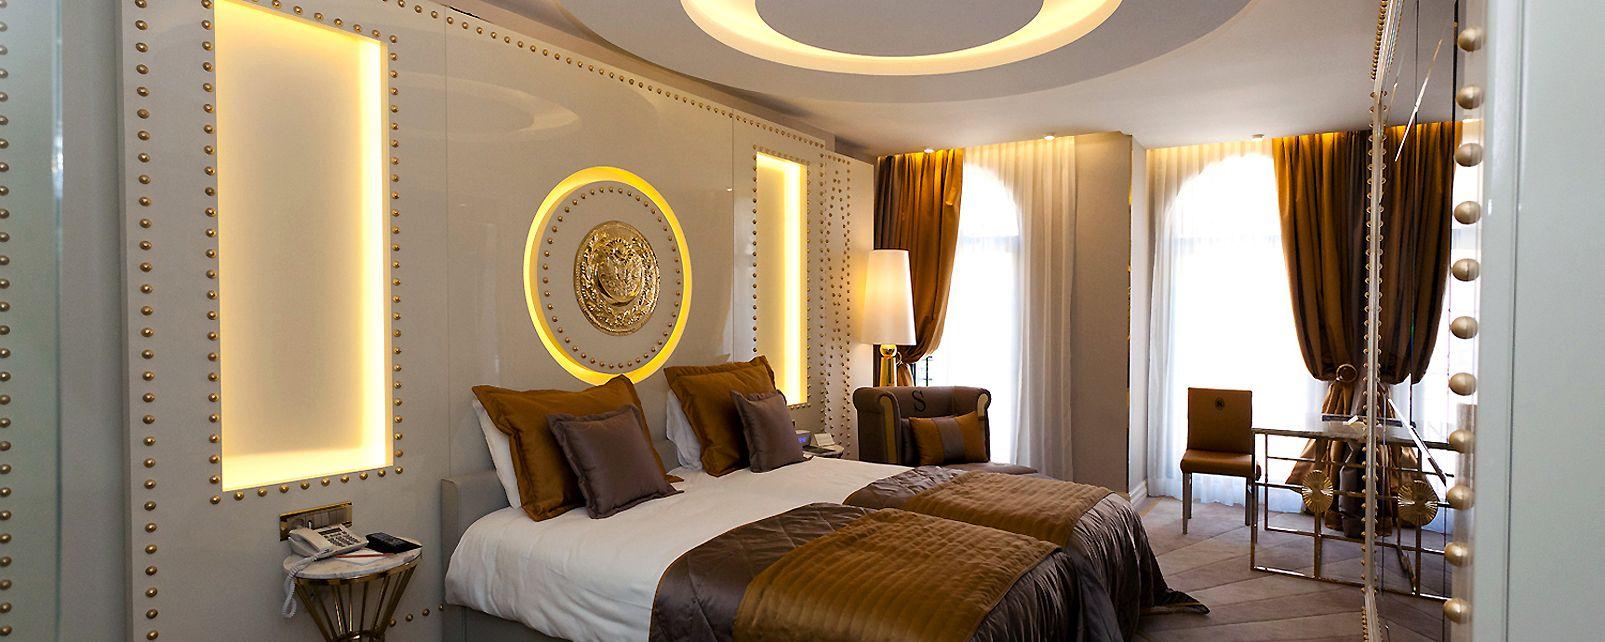 Hôtel Sura Design hôtel suites